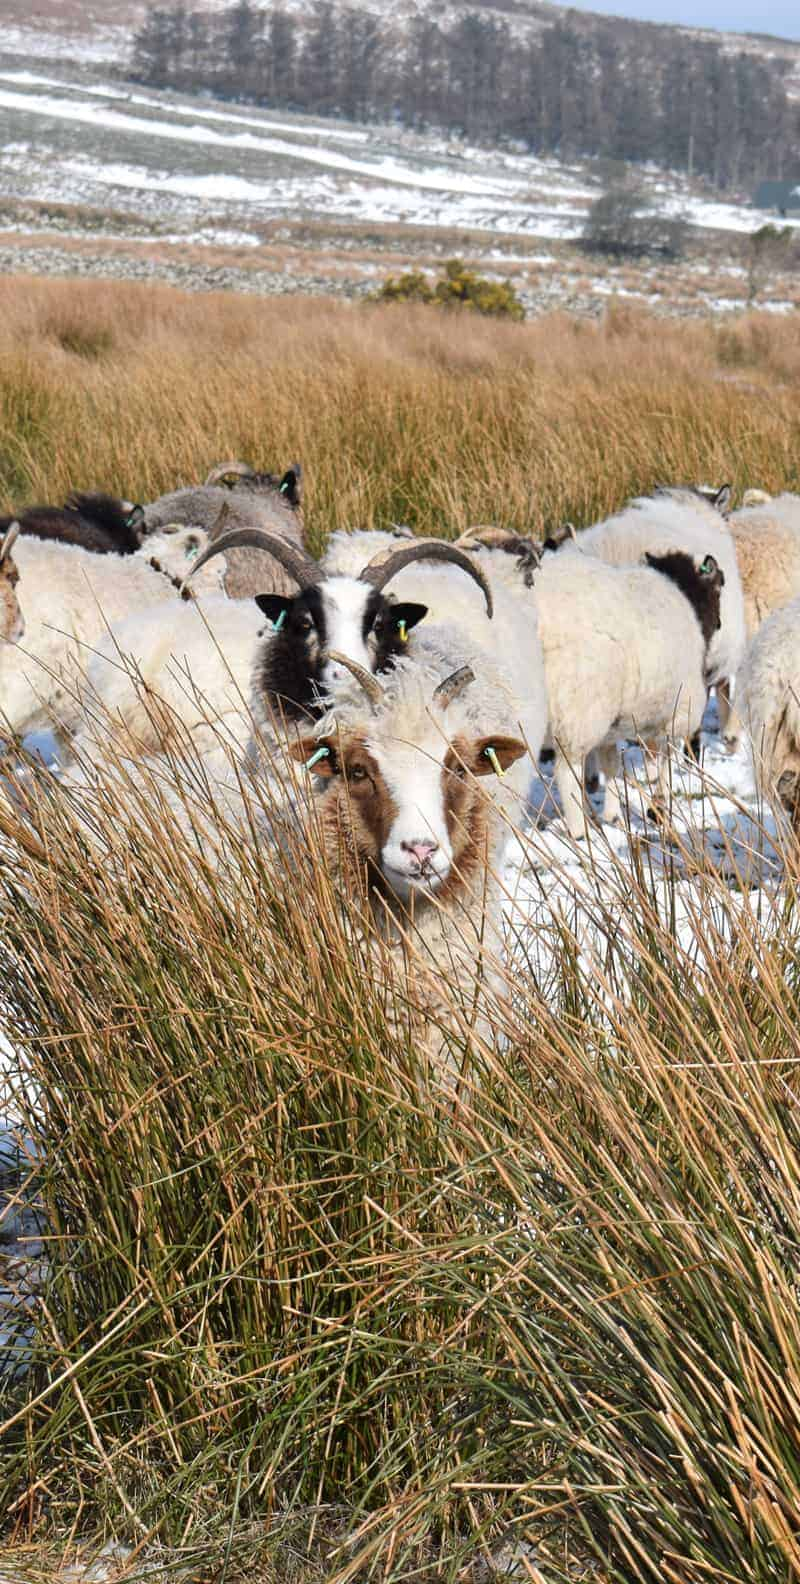 Muffn patchwork sheep moorit brown spotted jacob sheep shetland sheep snow